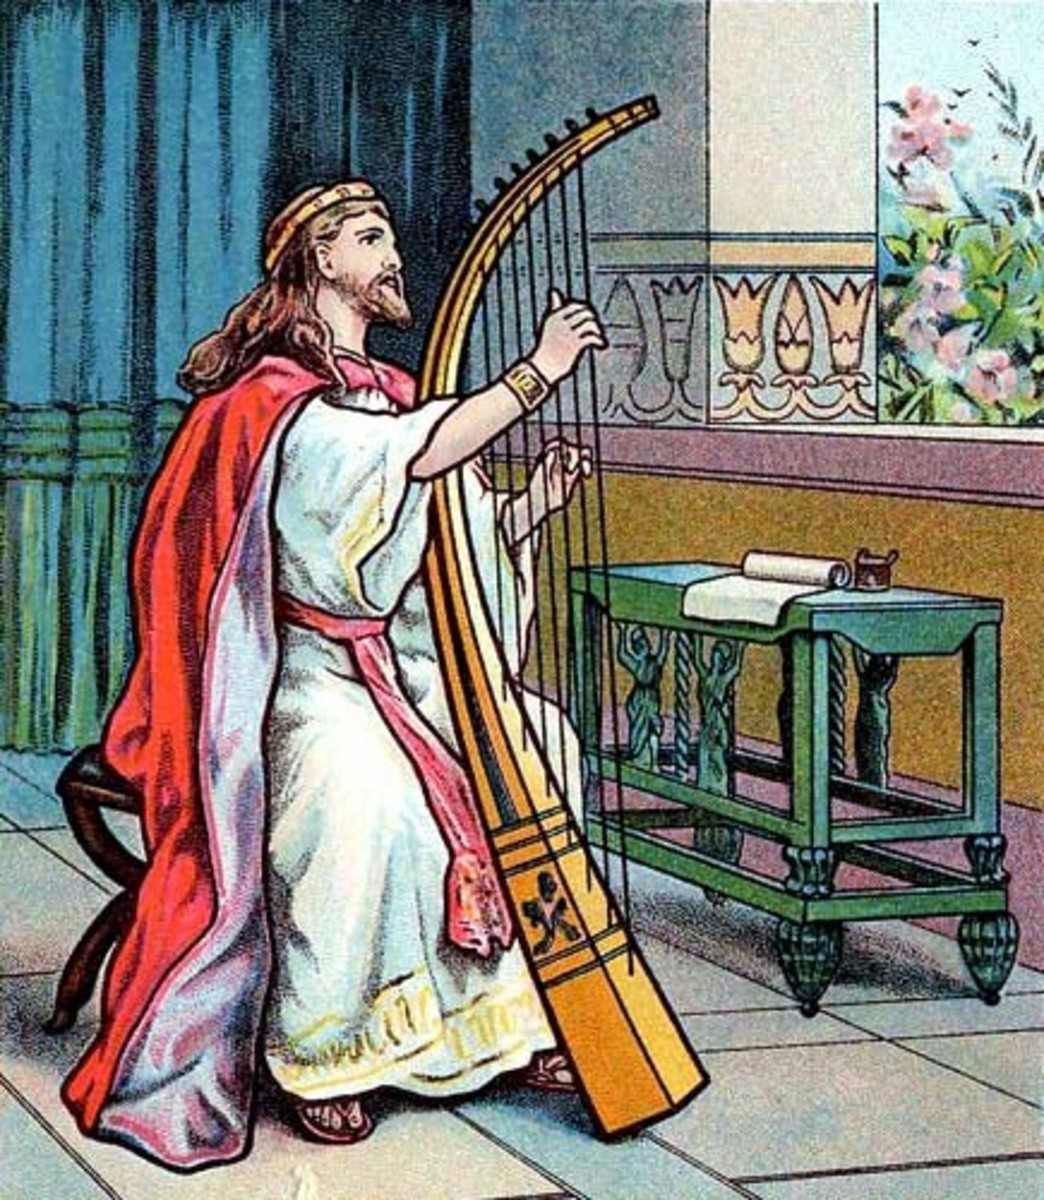 A harpist playing a harp.